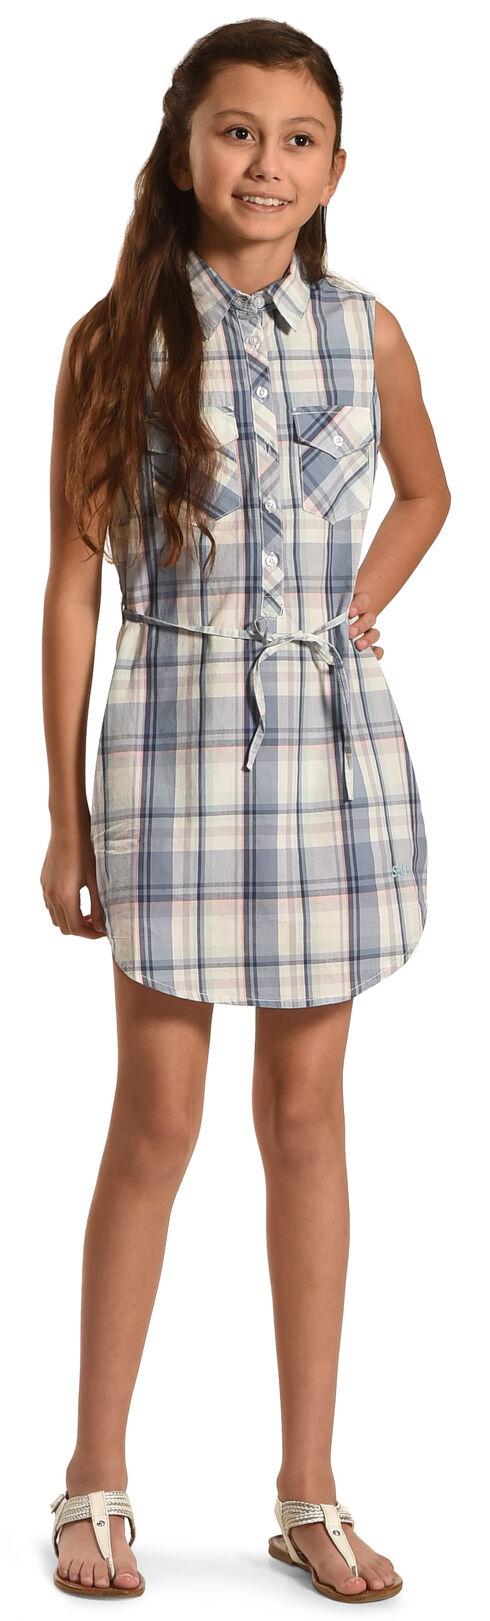 Silver Girls' Blue Plaid Shirt Dress , Blue, hi-res